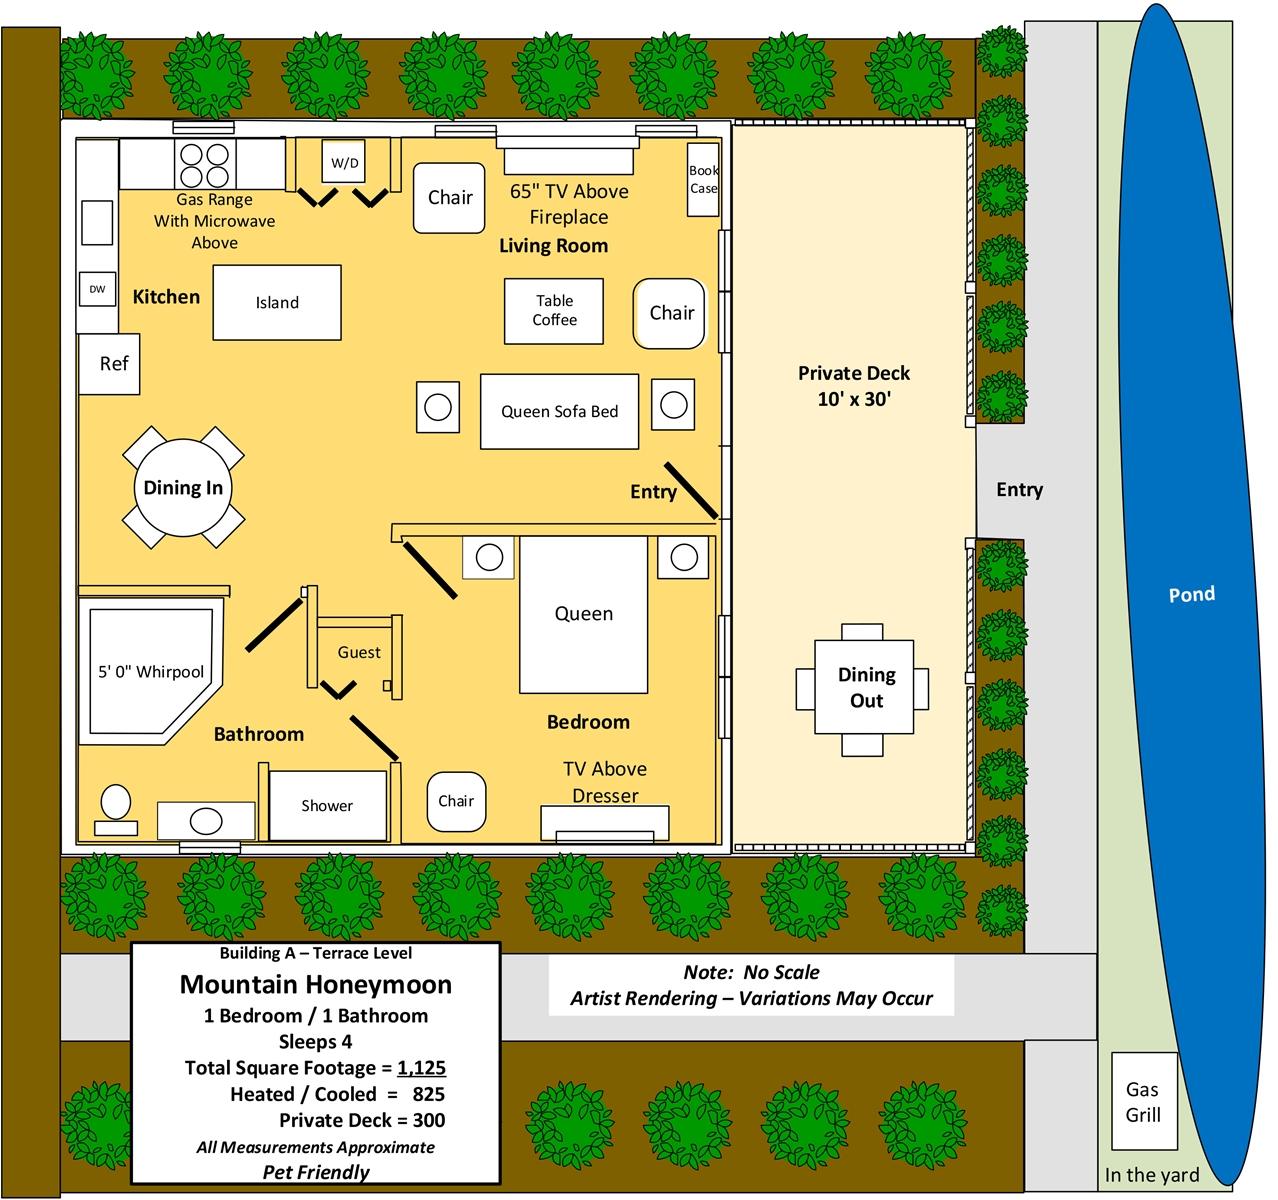 Floor Plan for Mountain Honeymoon